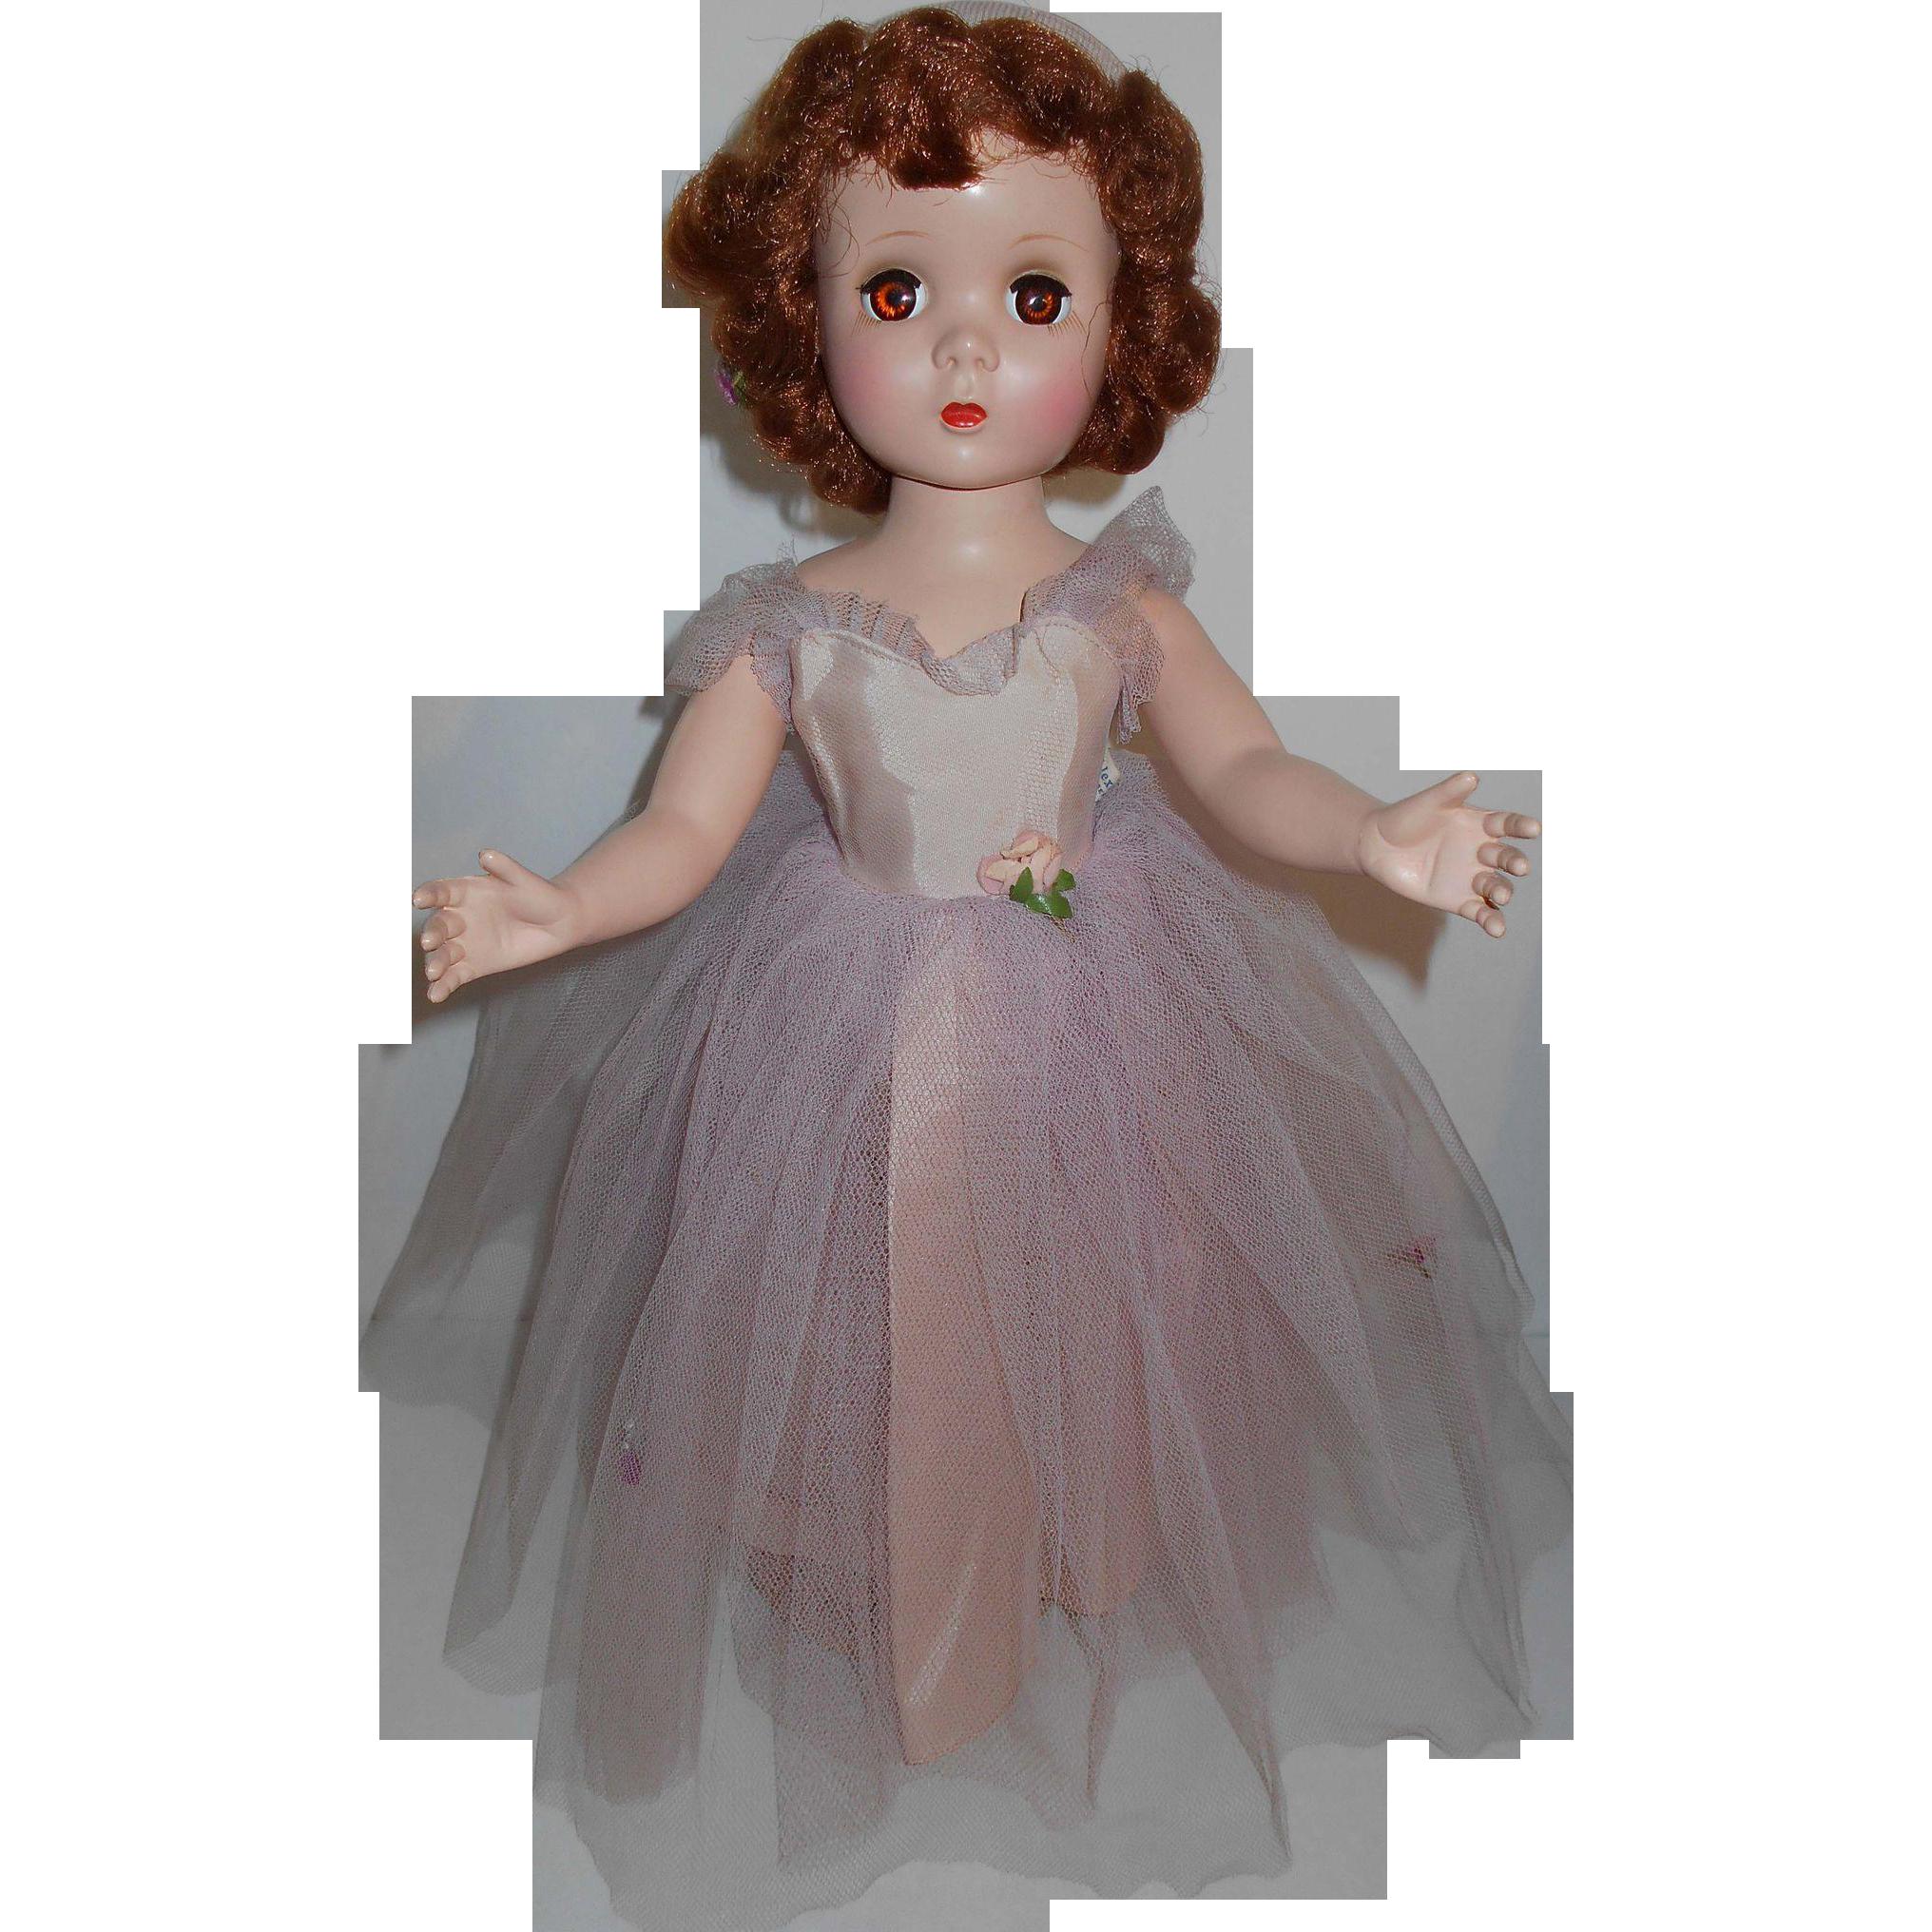 Madame Alexander ROSAMUND BRIDESMAID Doll ~ Hard Plastic Walker Maggie Face Red Head All Original